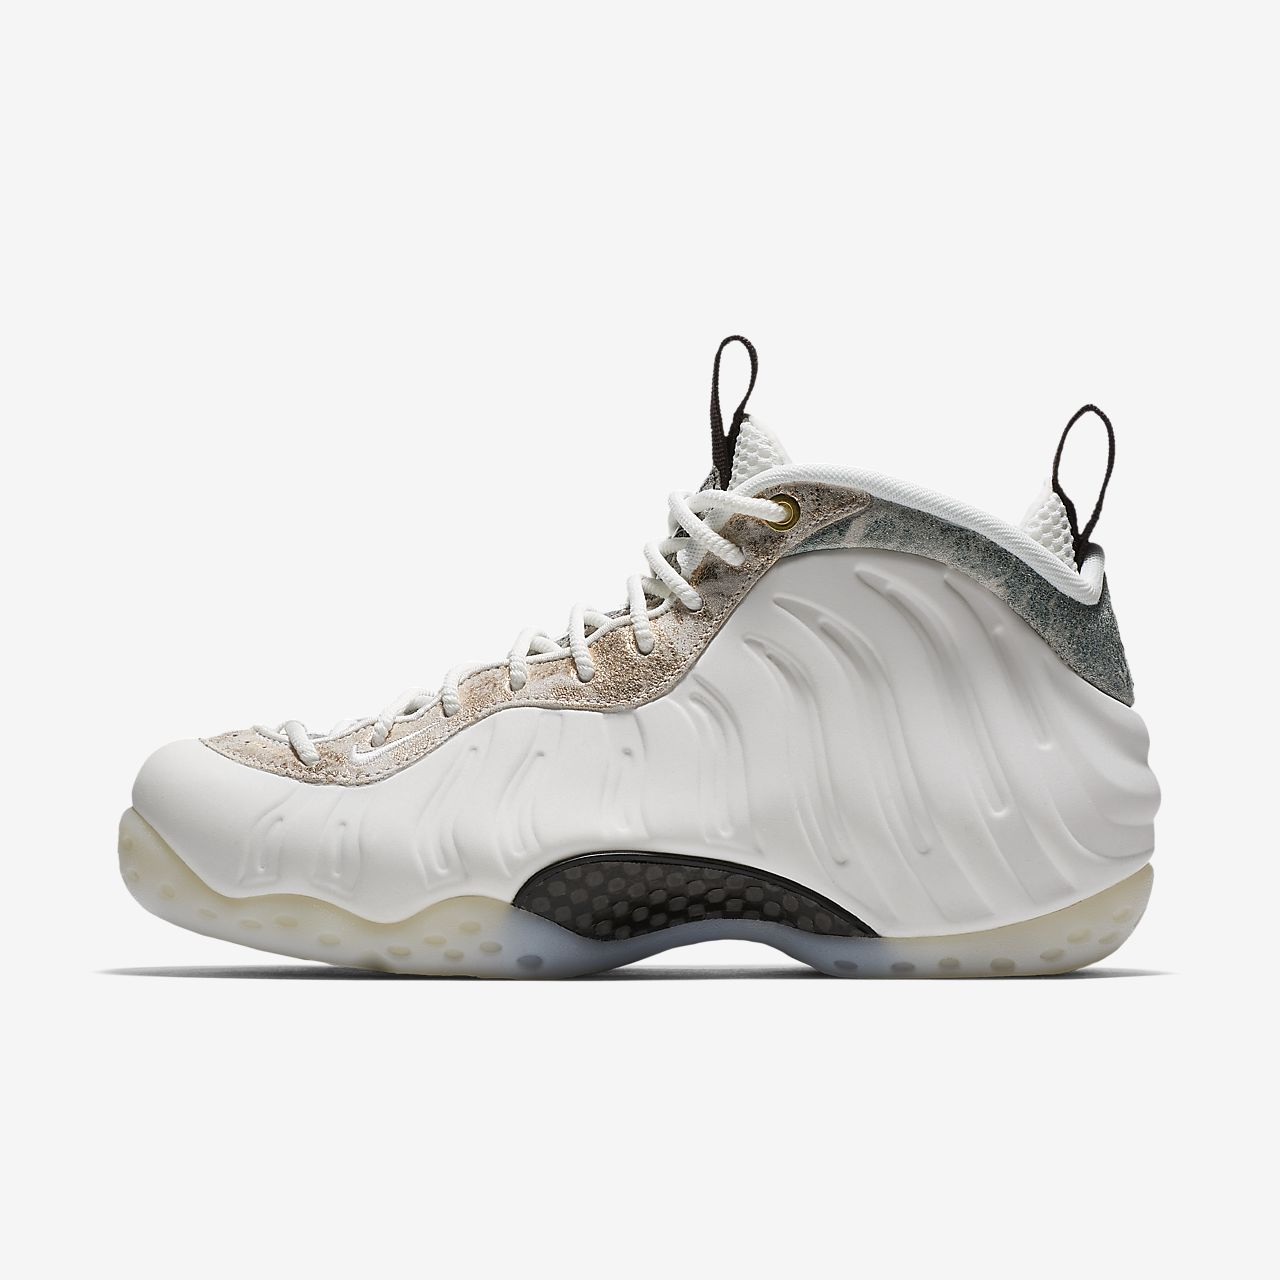 best sneakers 1d2fc b9550 ... real nike air foamposite 1 womens shoe bc397 8cf6b